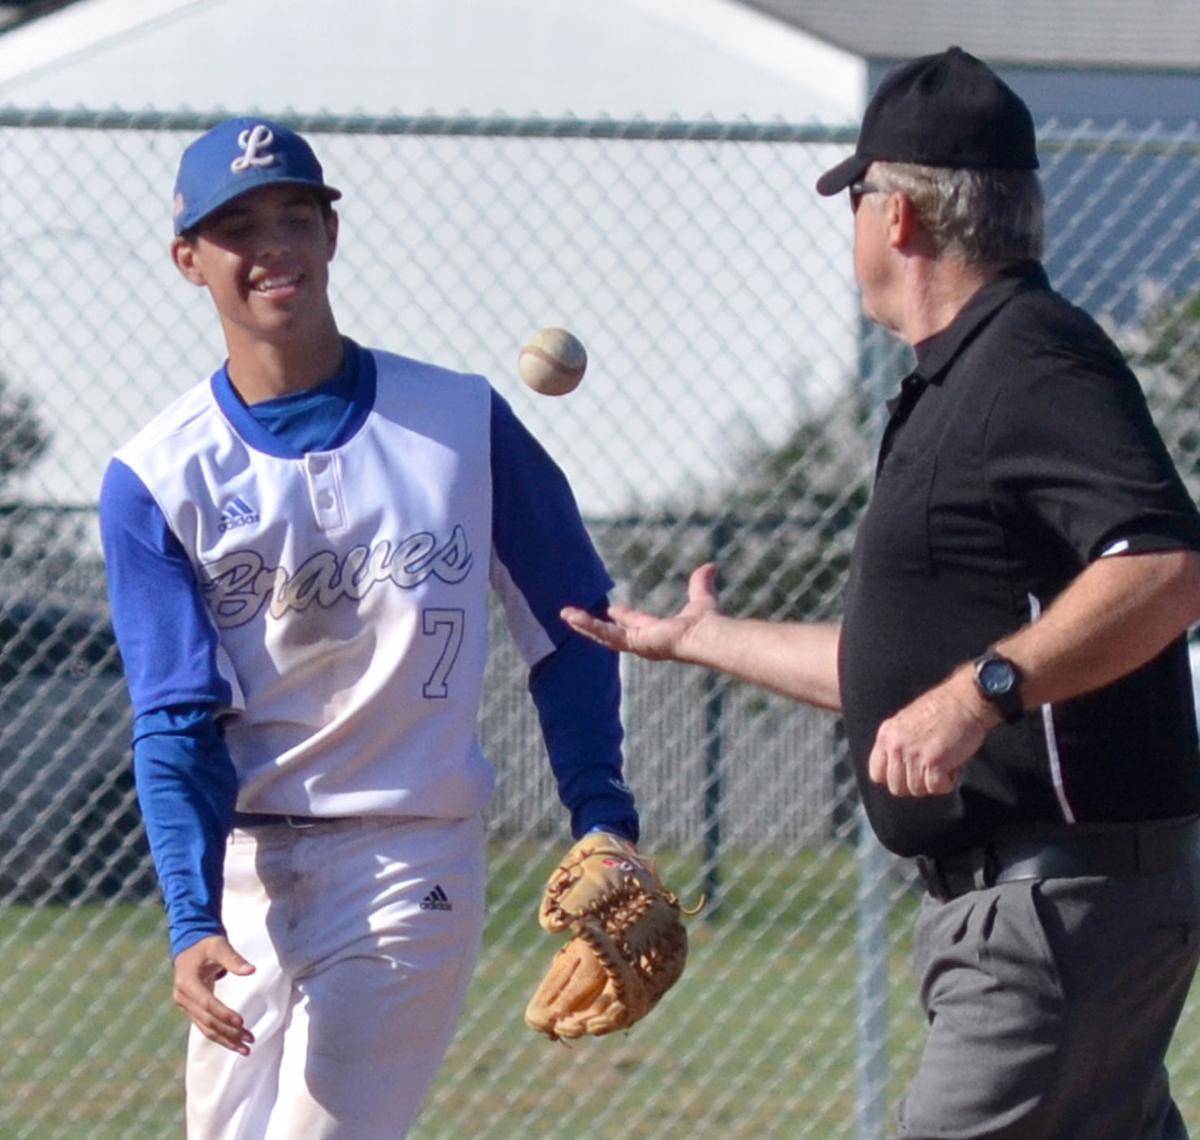 041718 Lompoc Baseball 08.JPG